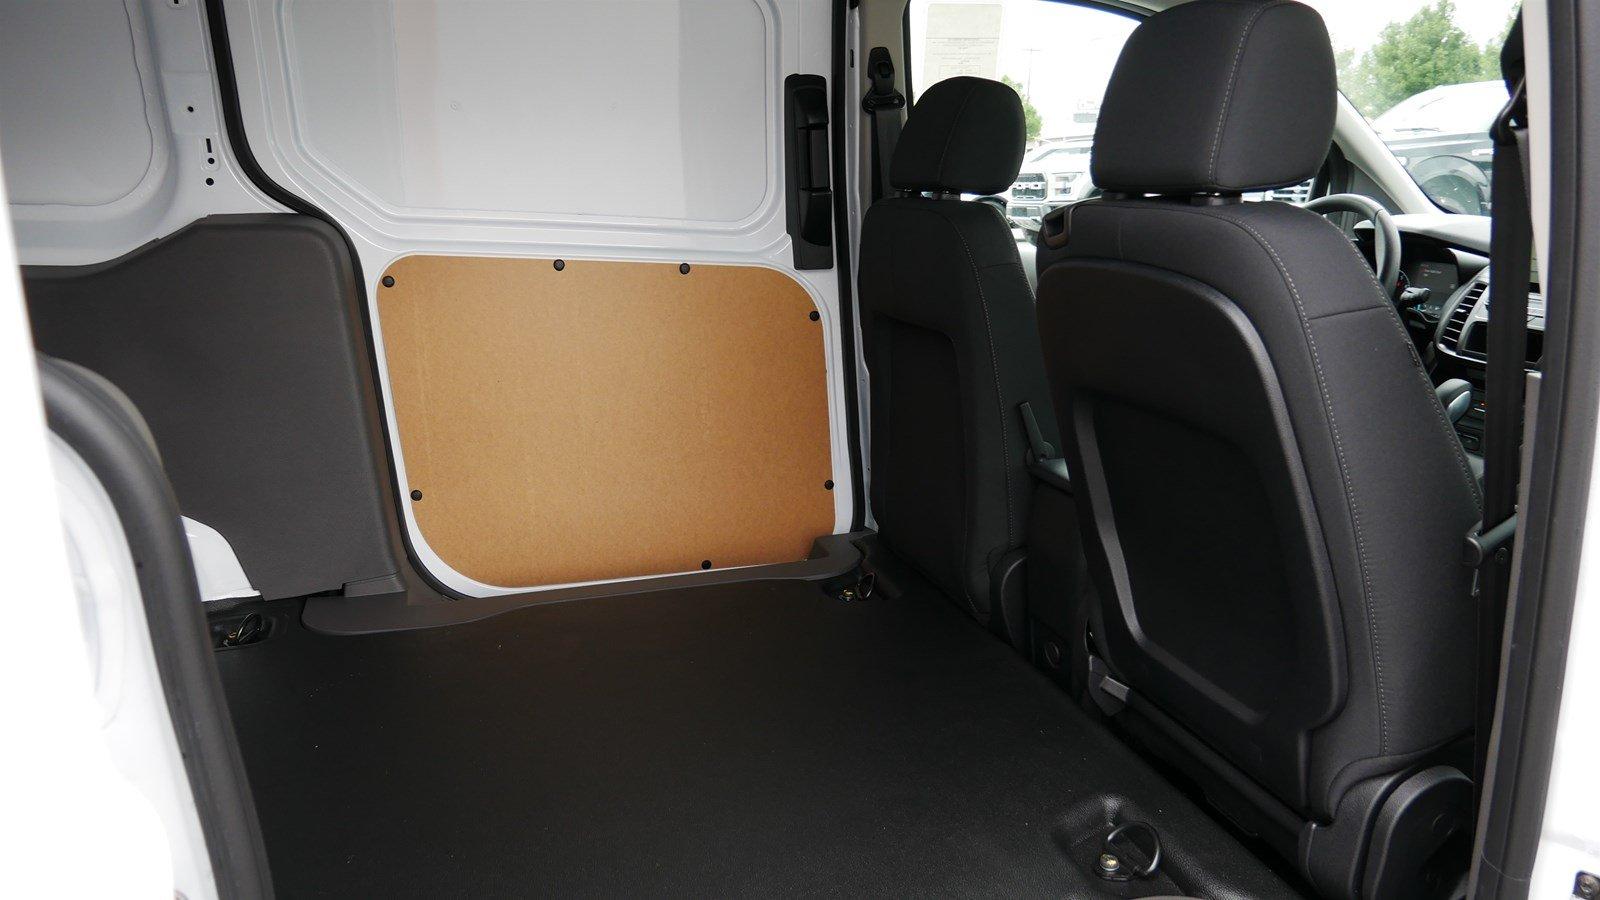 2019 Transit Connect 4x2, Empty Cargo Van #62942 - photo 27